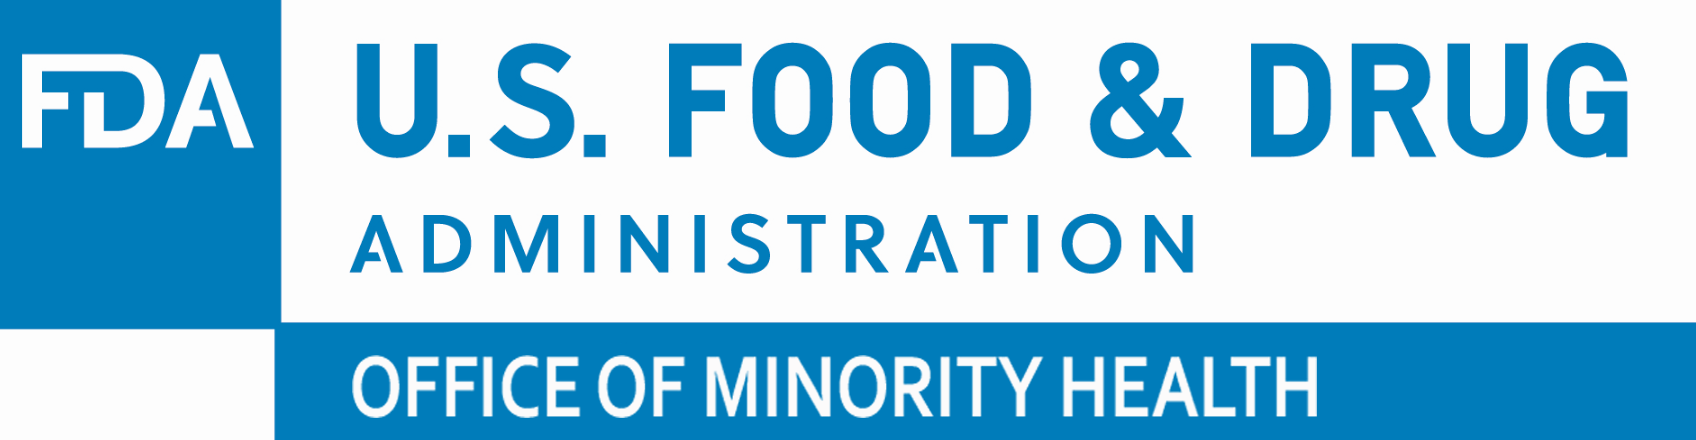 FDA Office of Minority Health Logo